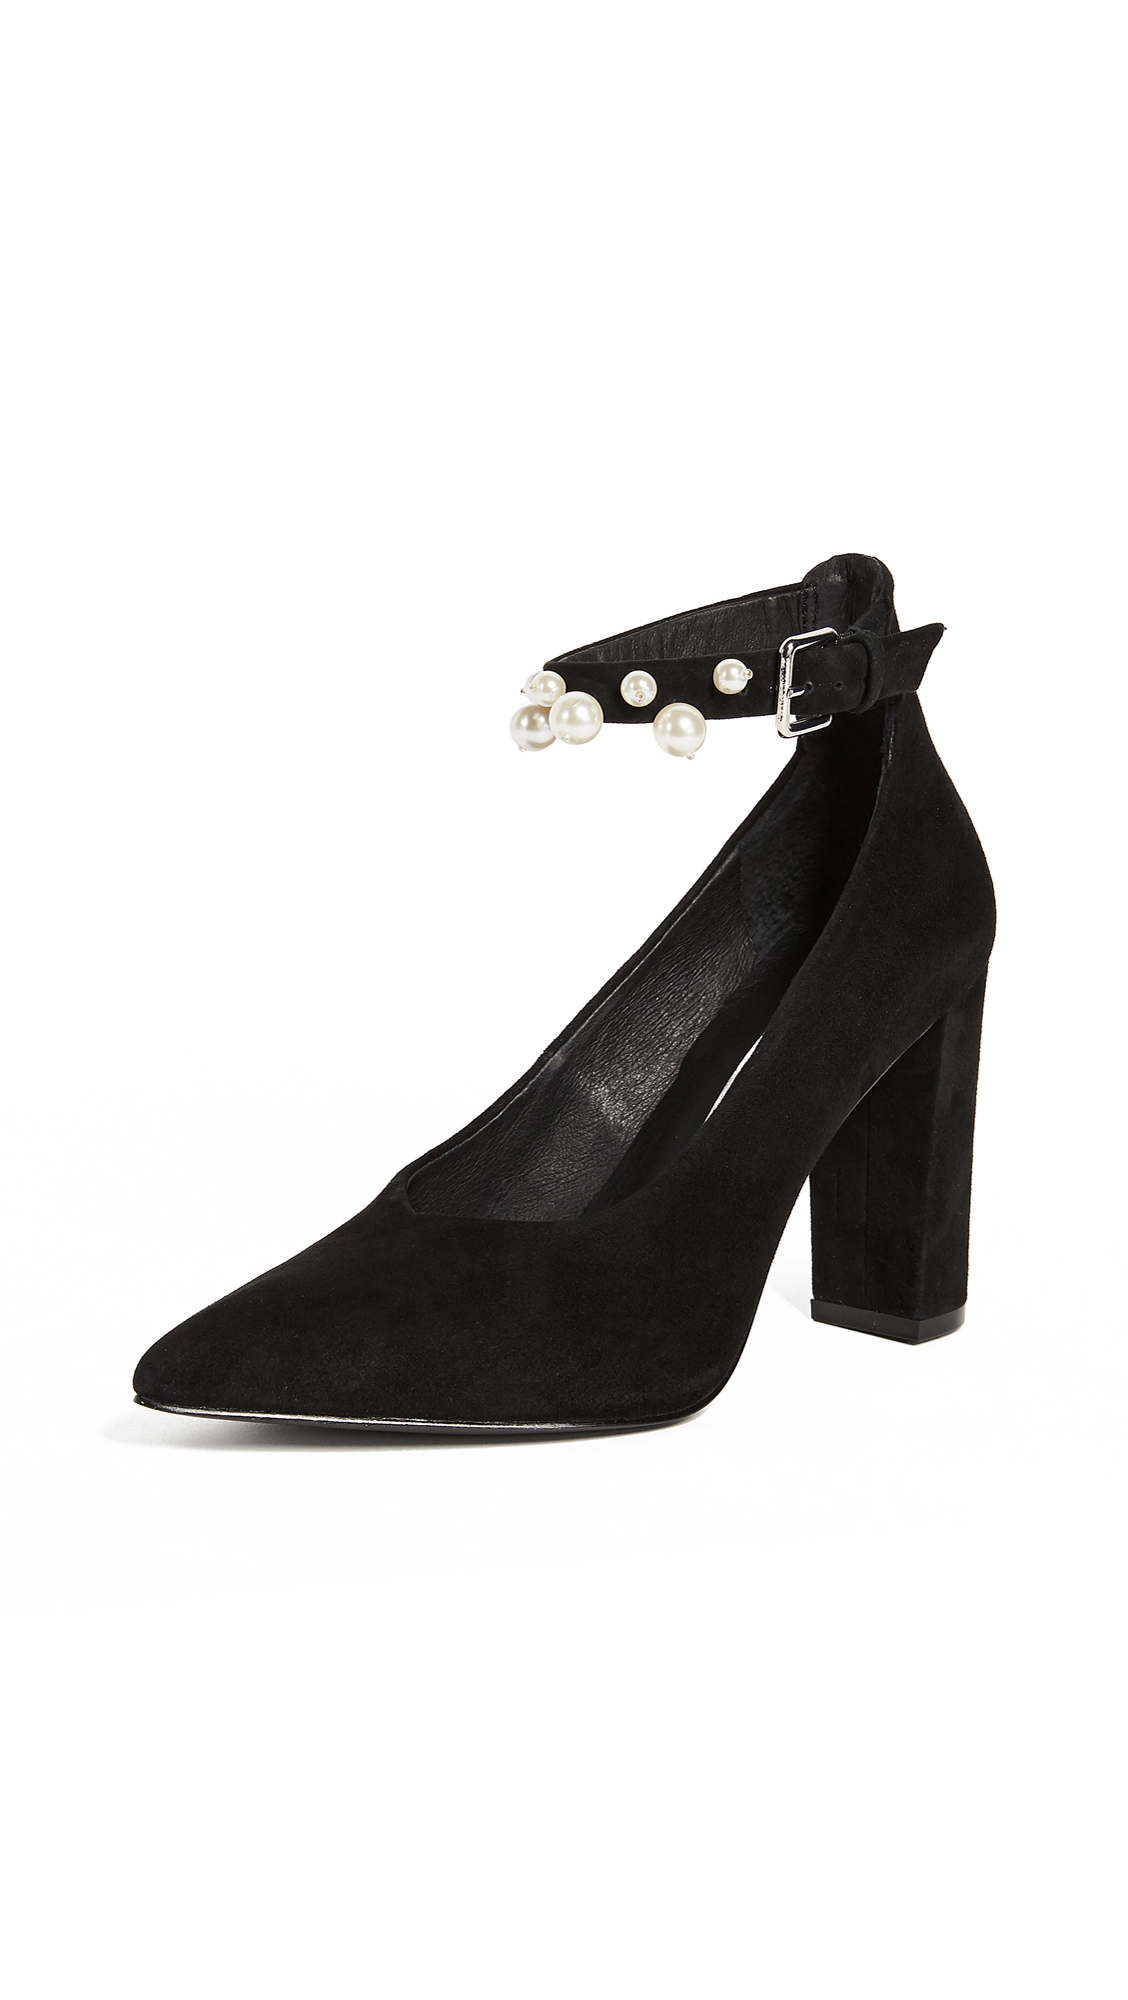 Sol Sana Isla Ankle Strap Pumps - Black